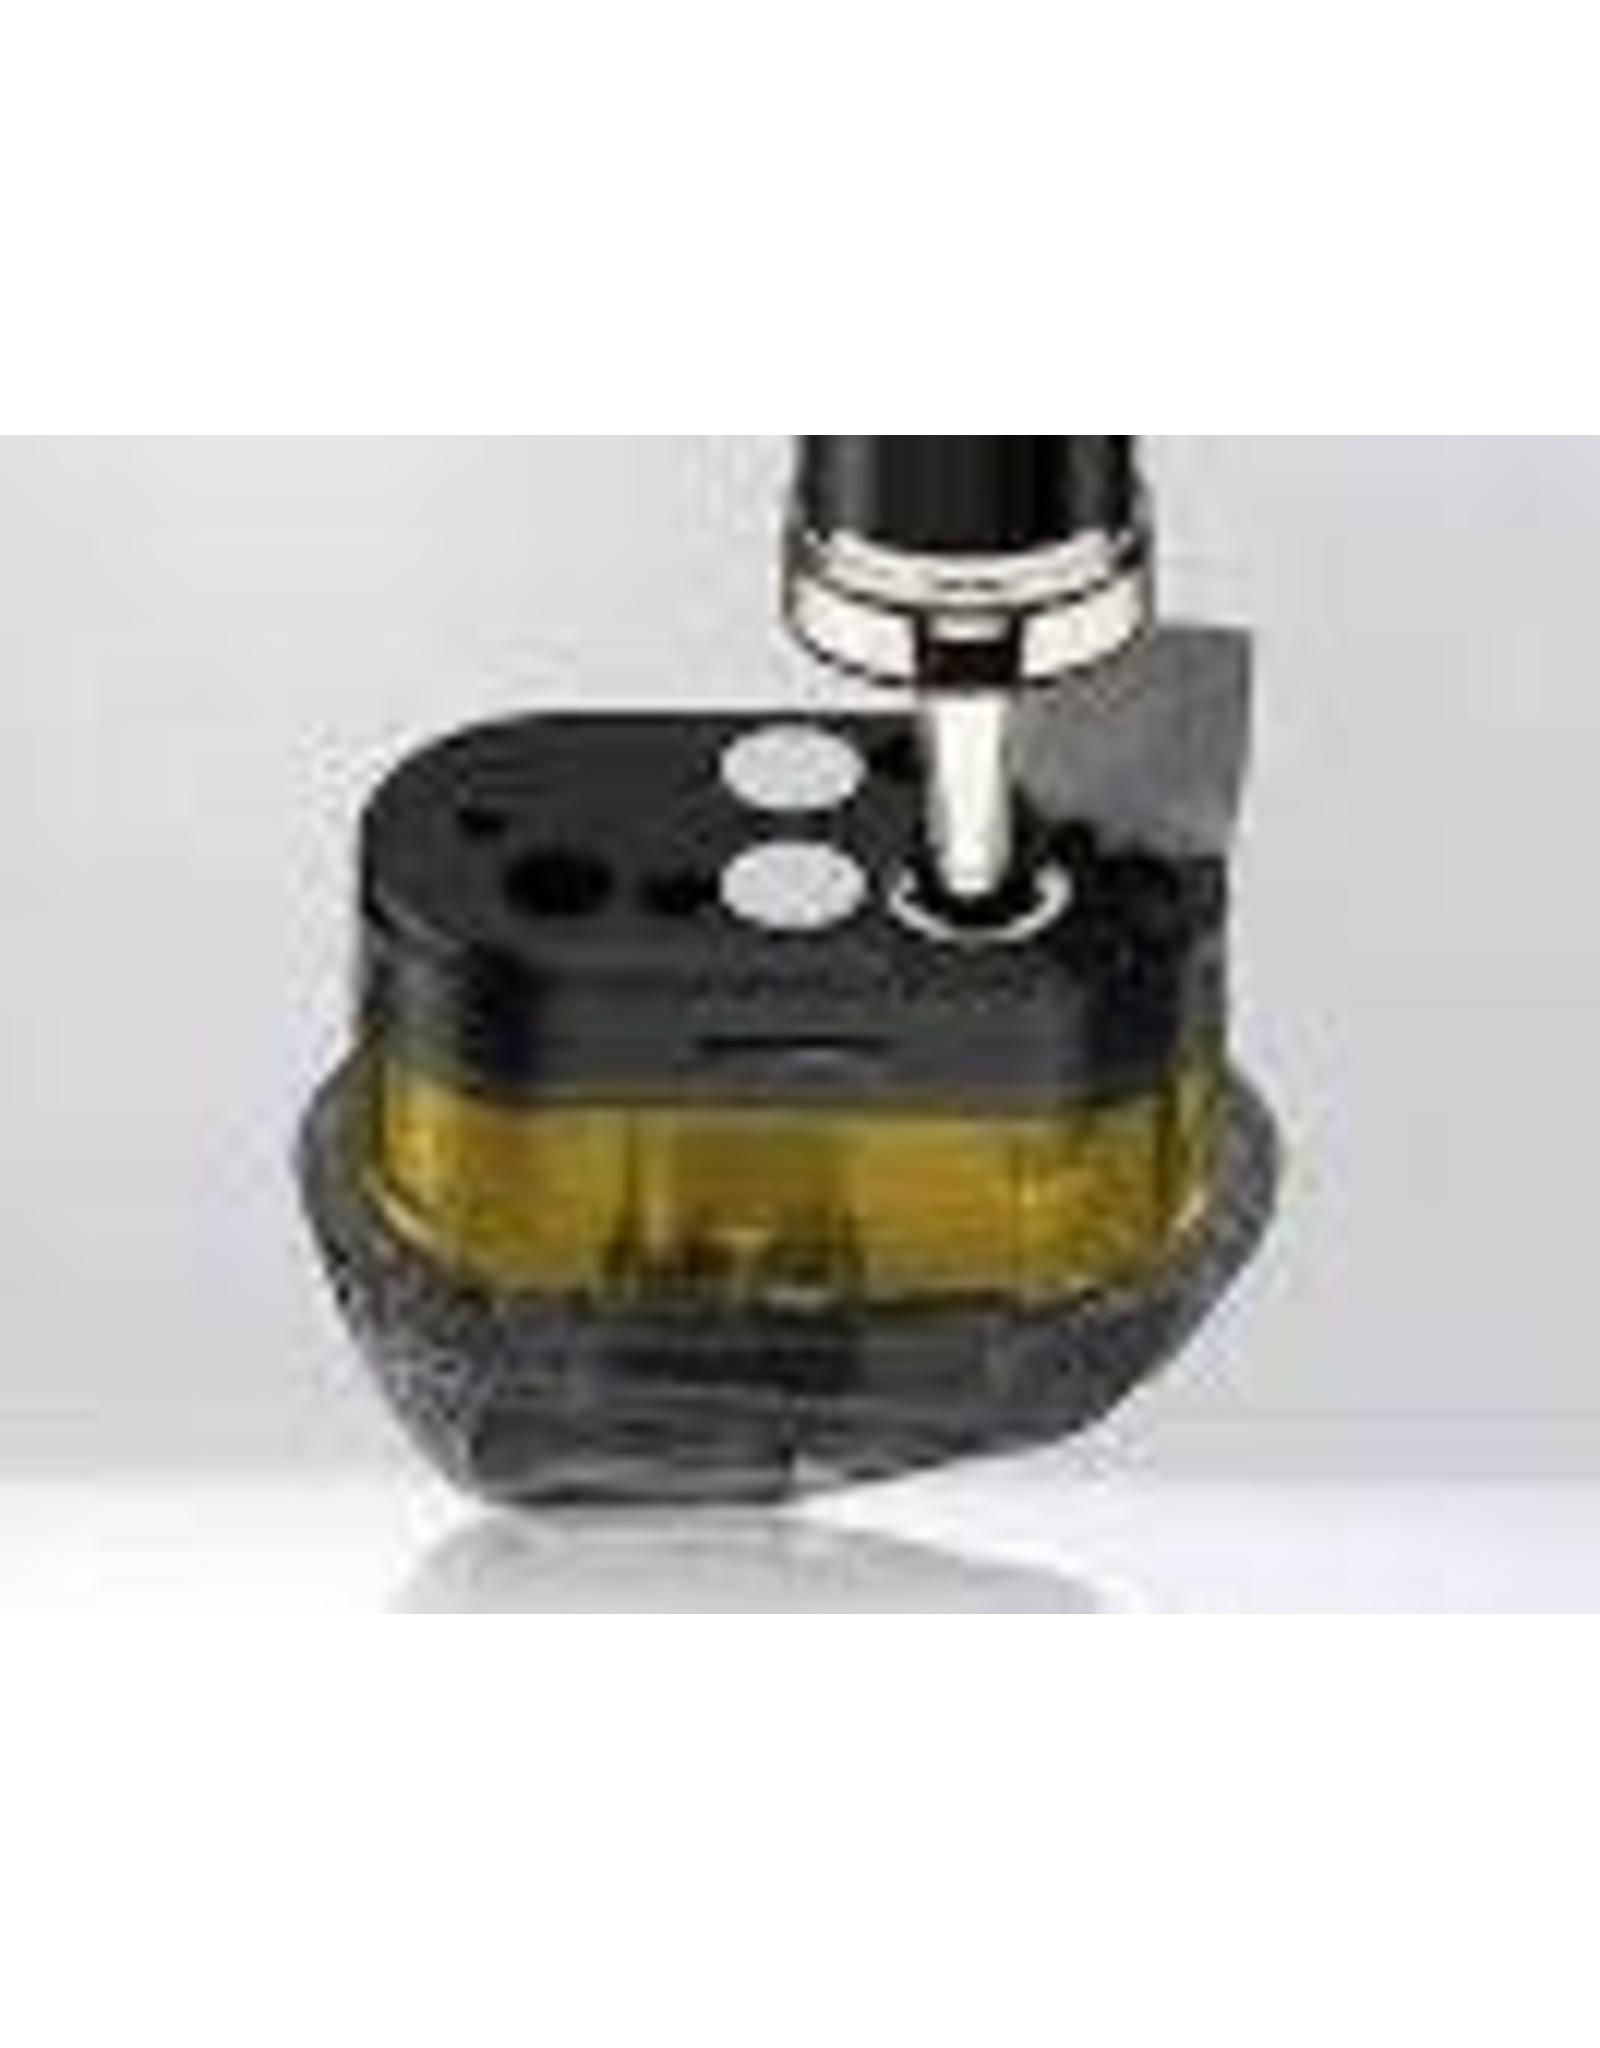 Aspire Aspire Minican Replacement Pods (2/Pk) [CRC] 1.2 ohm Mesh